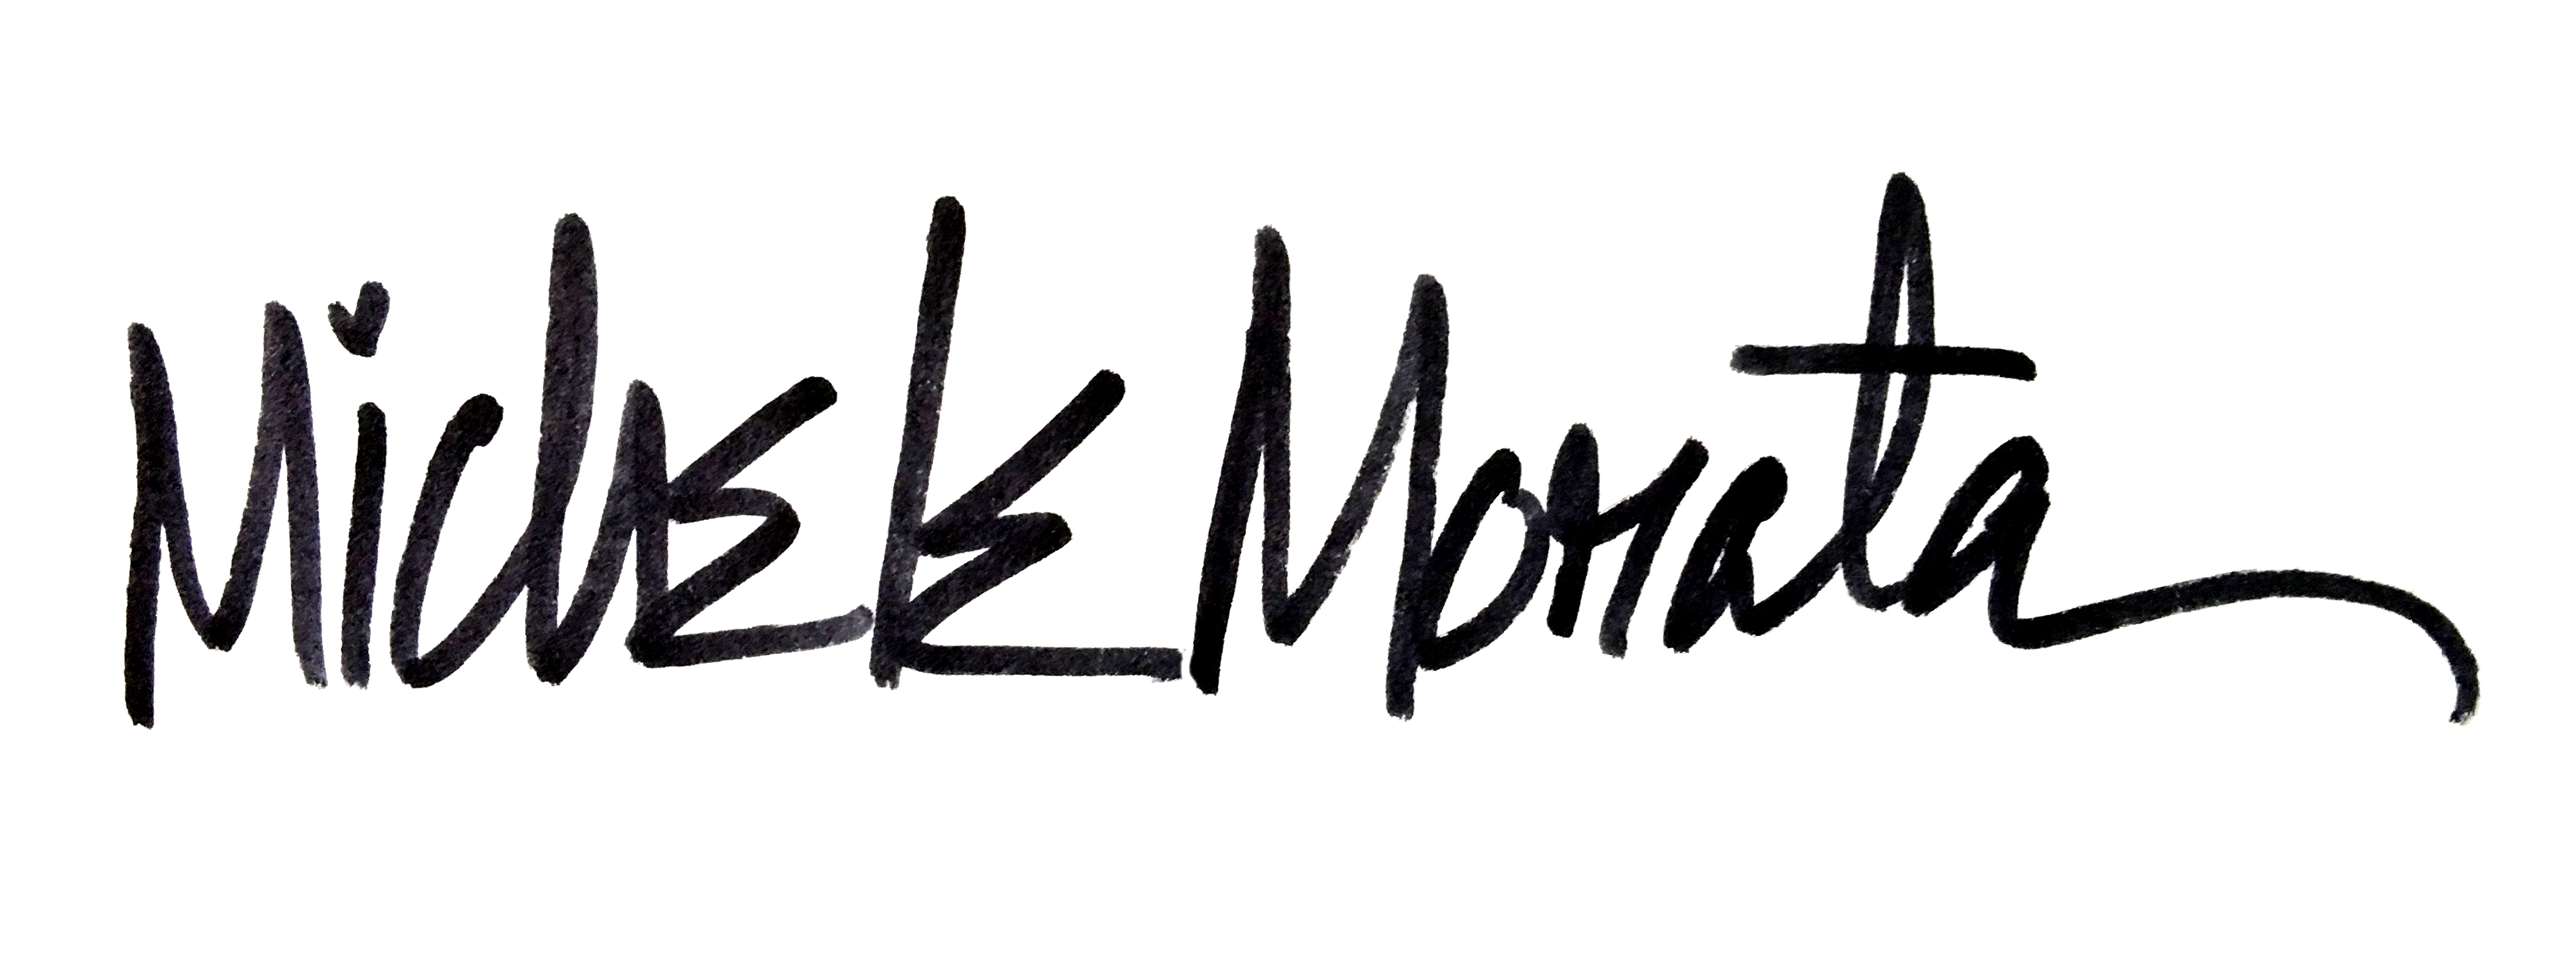 michele morata's Signature